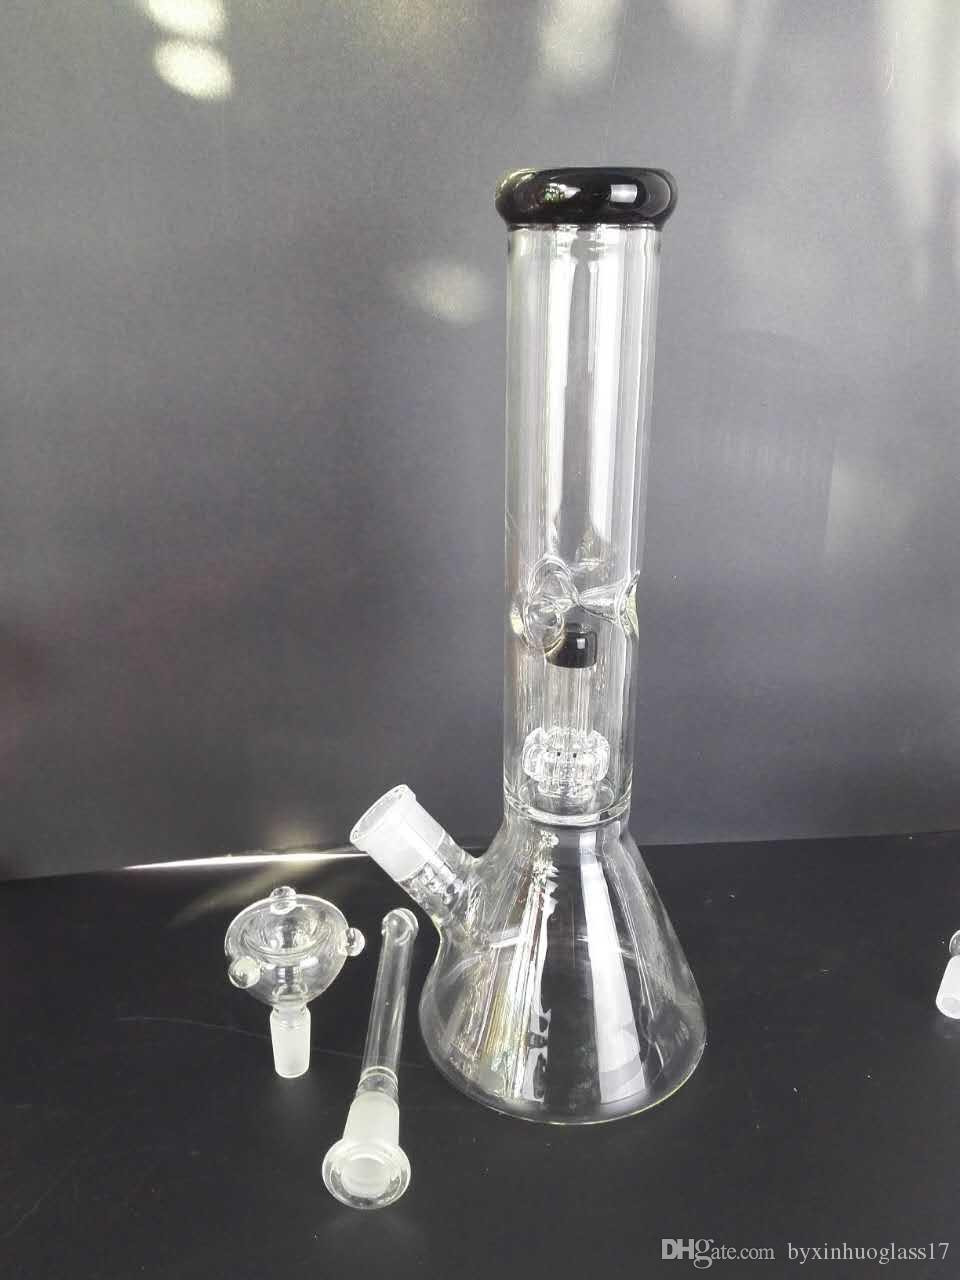 High 30 cm triangular hookah glass pipe,glass bong black